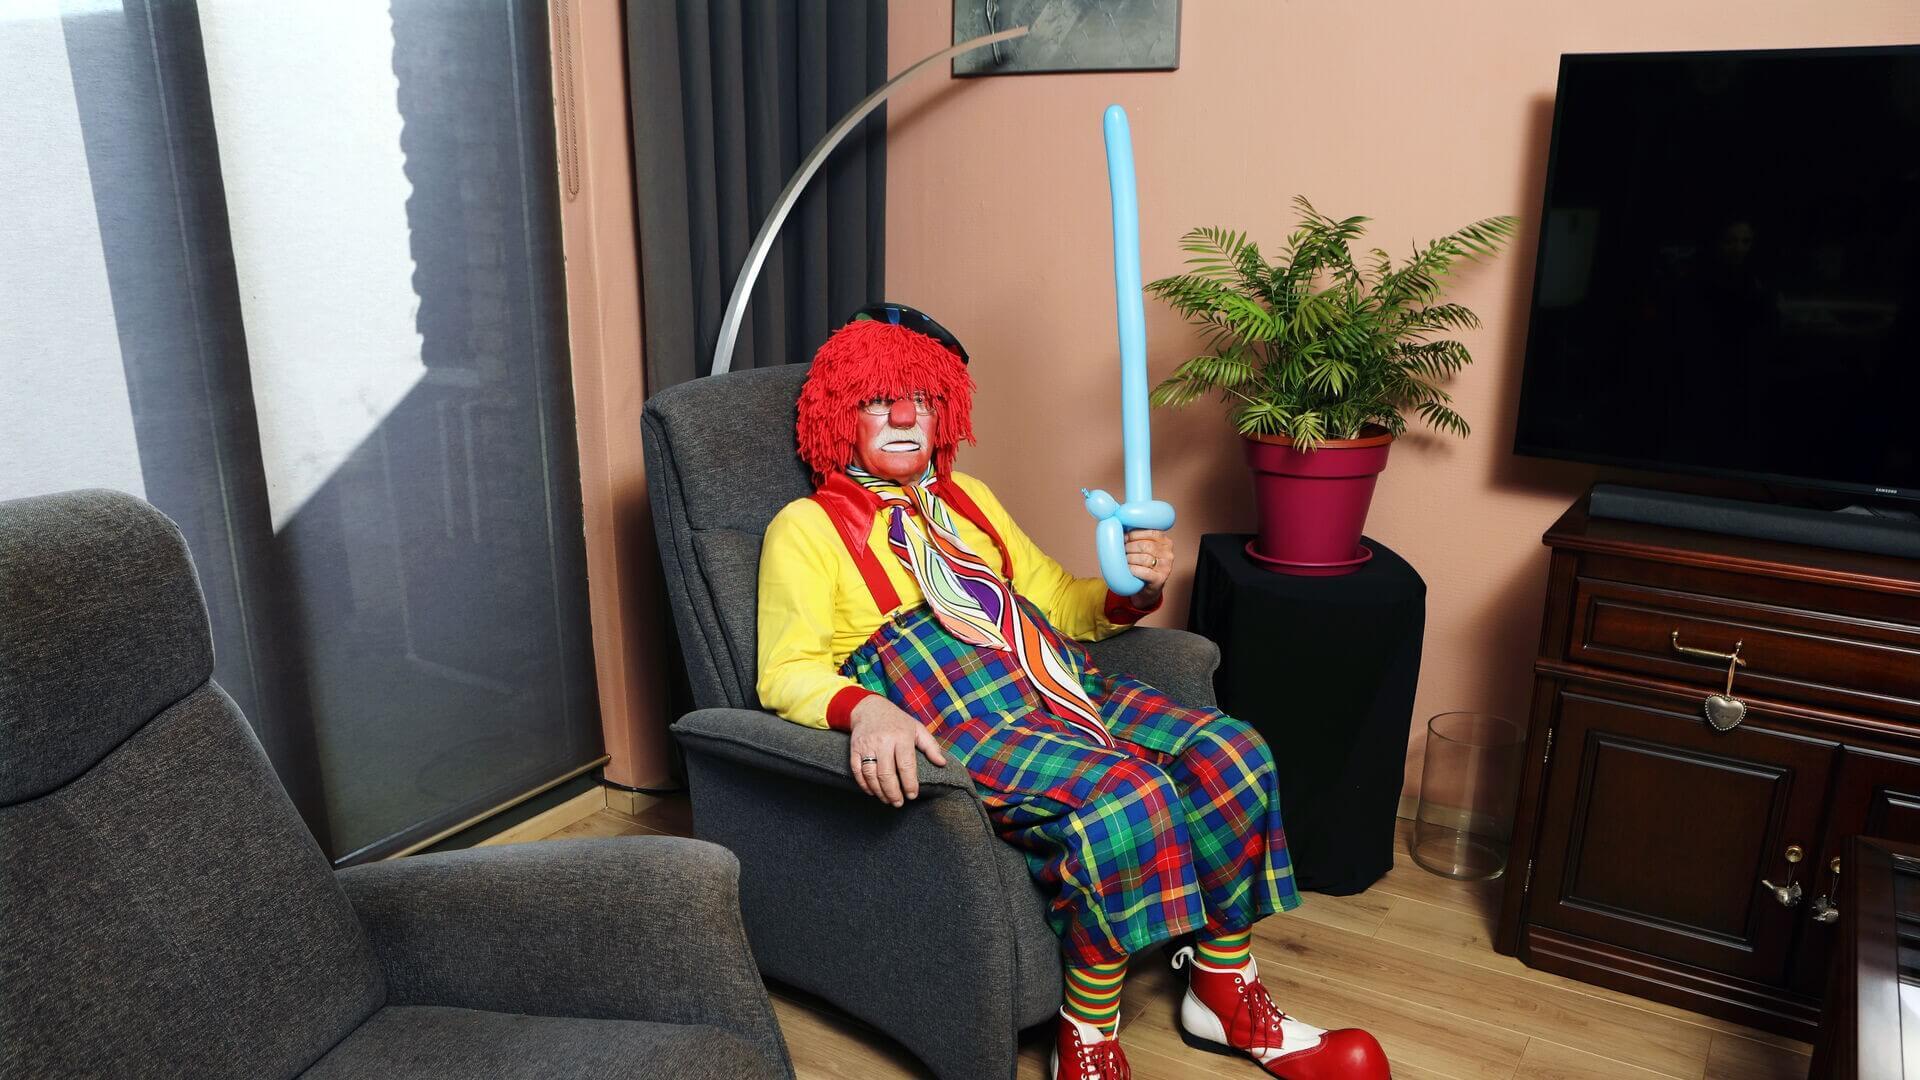 Campagnebeeld Wunderbaum - The Clowns convention - Foto Jan Dirk van der Burg